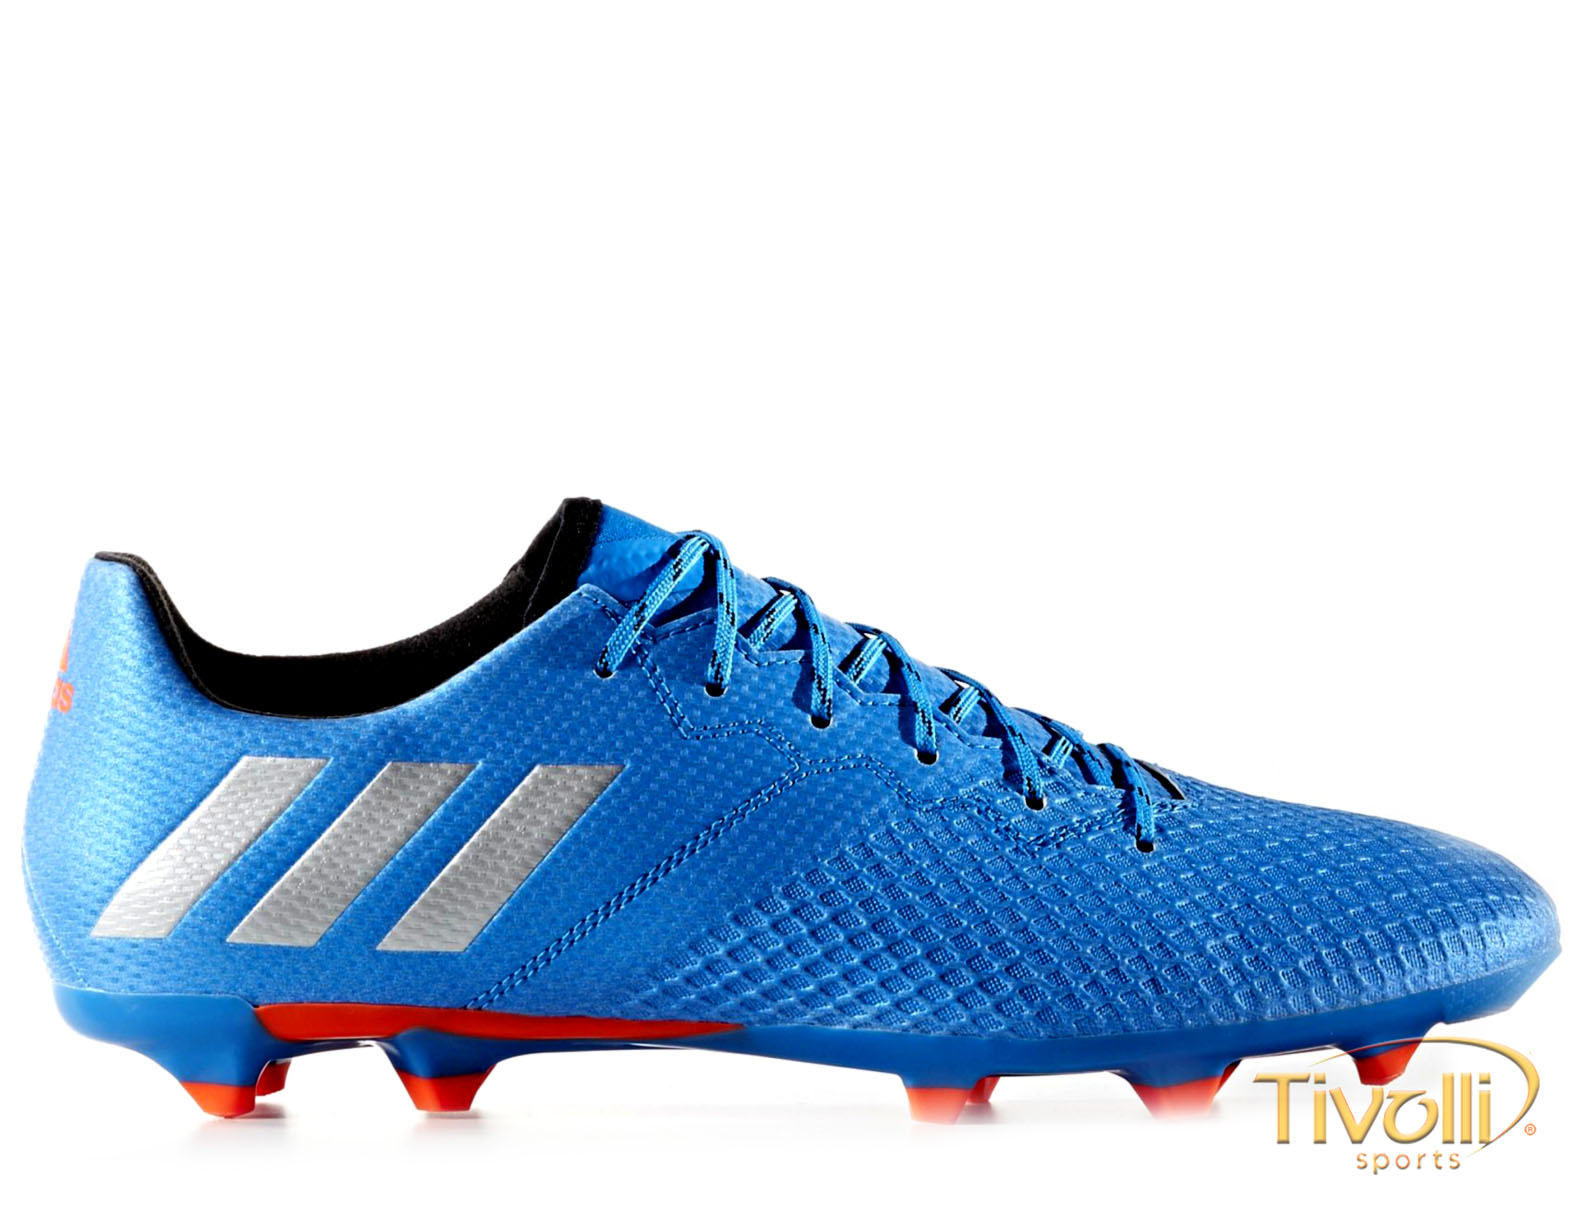 443a92a8ce4 Chuteira Adidas Messi 16.3 Firm Ground Cleats FG Campo